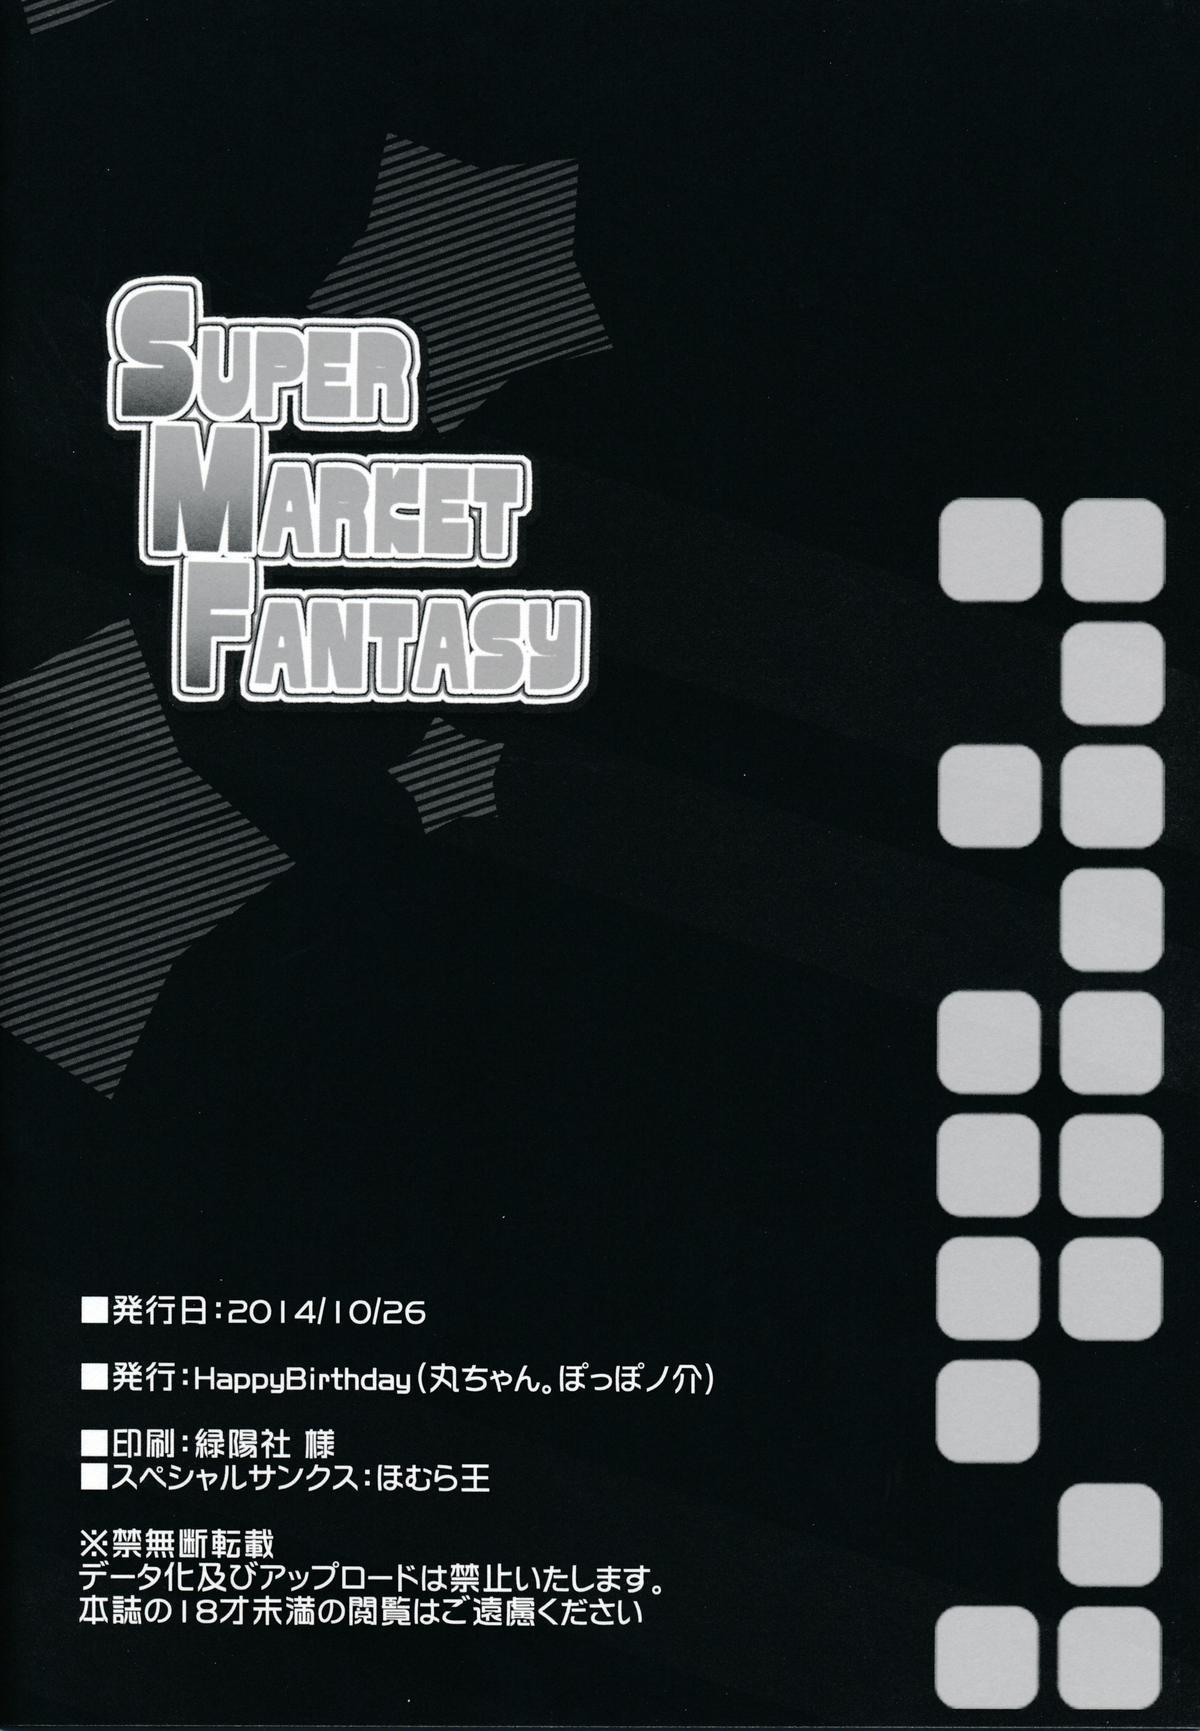 Super Market Fantasy 13